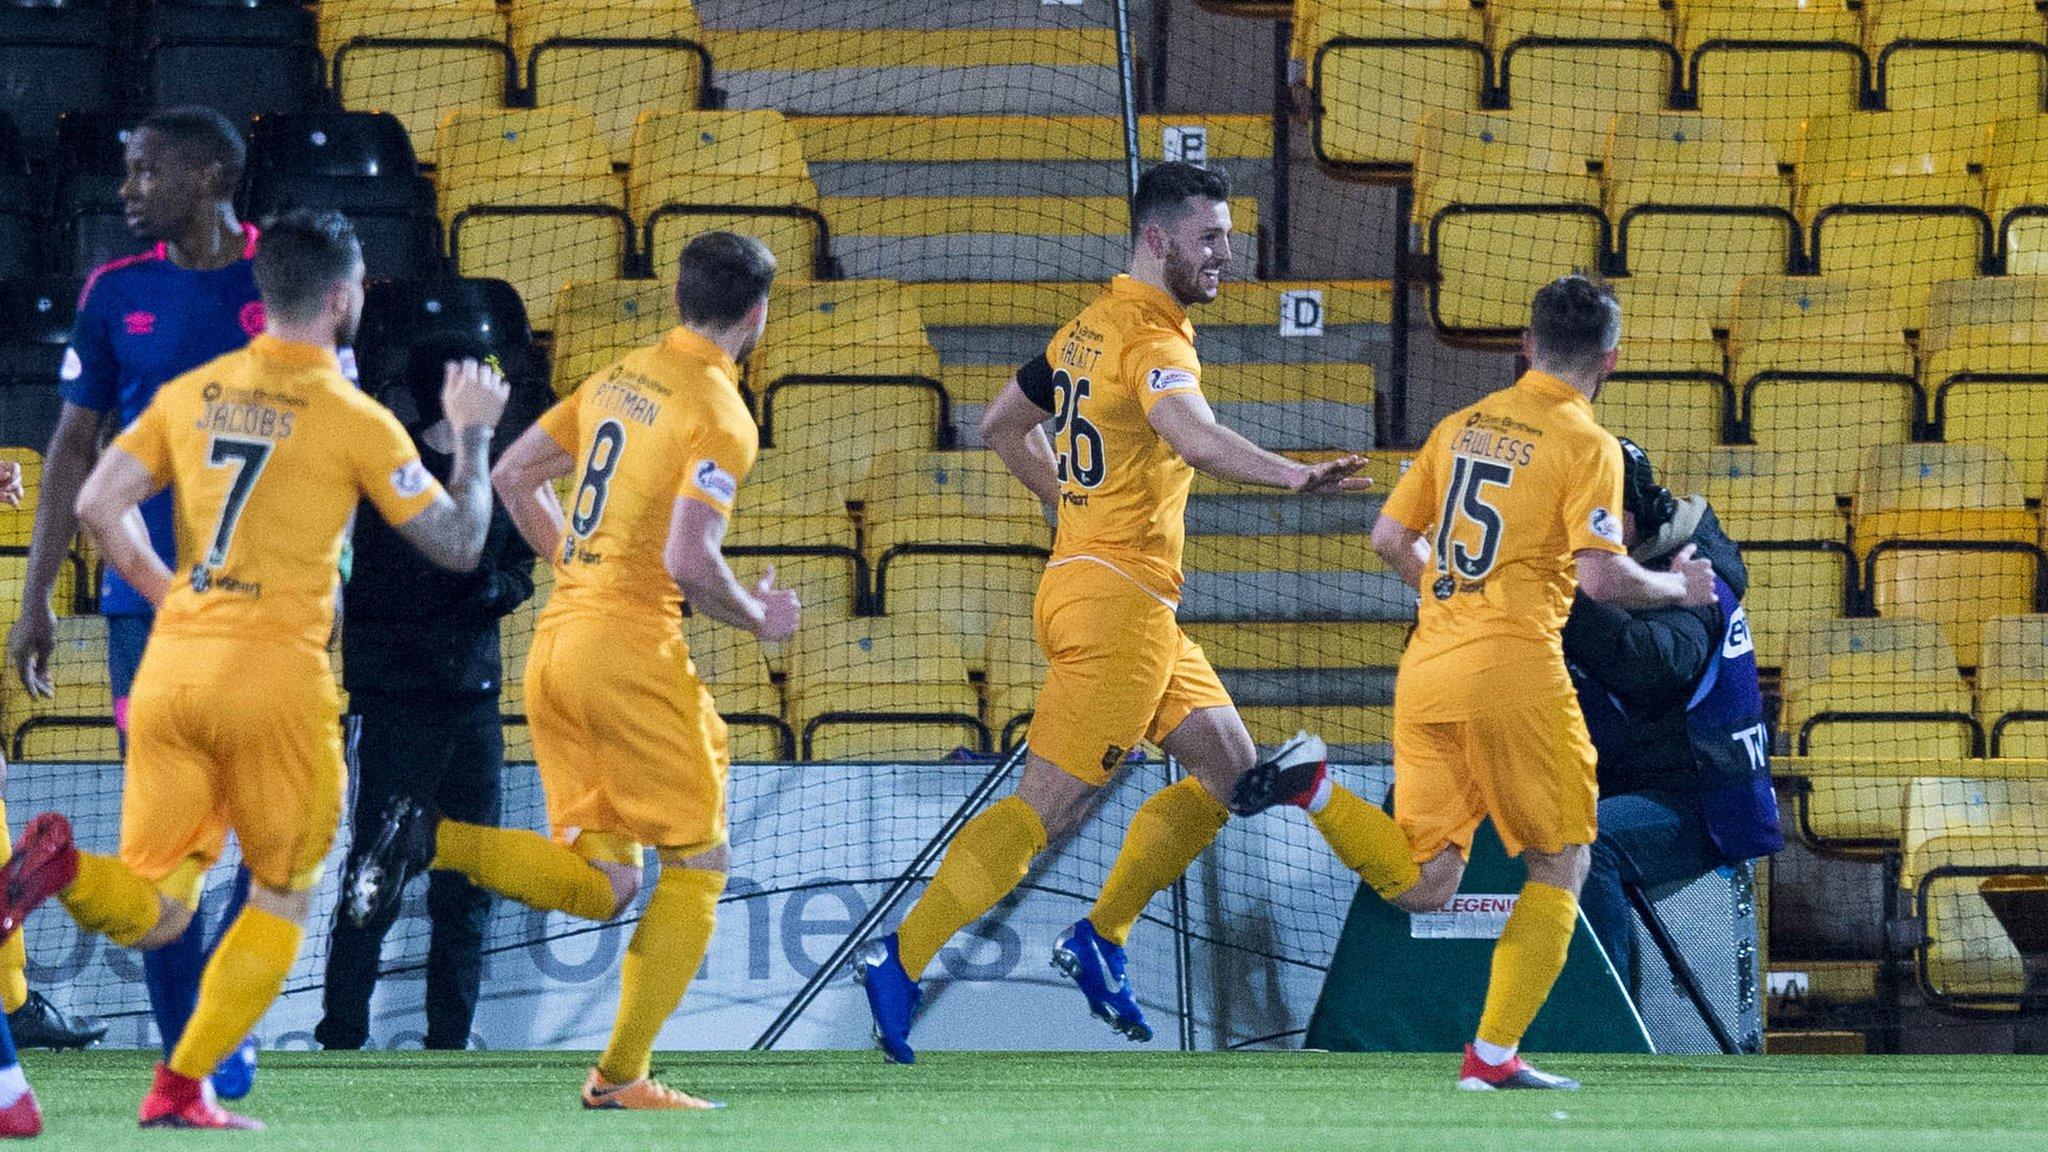 Livingston 5-0 Hearts: Hosts score five goals and Arnaud Djoum sent off in 14-minute spell